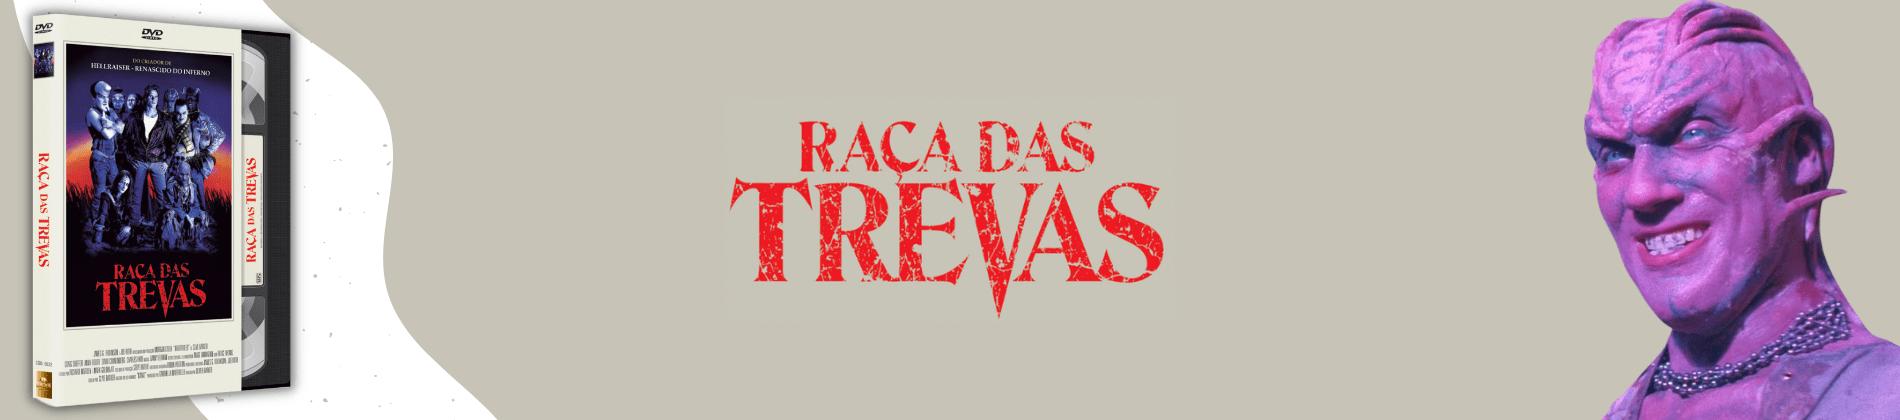 RAÇA DAS TREVAS - LONDON VHS COLLECTION